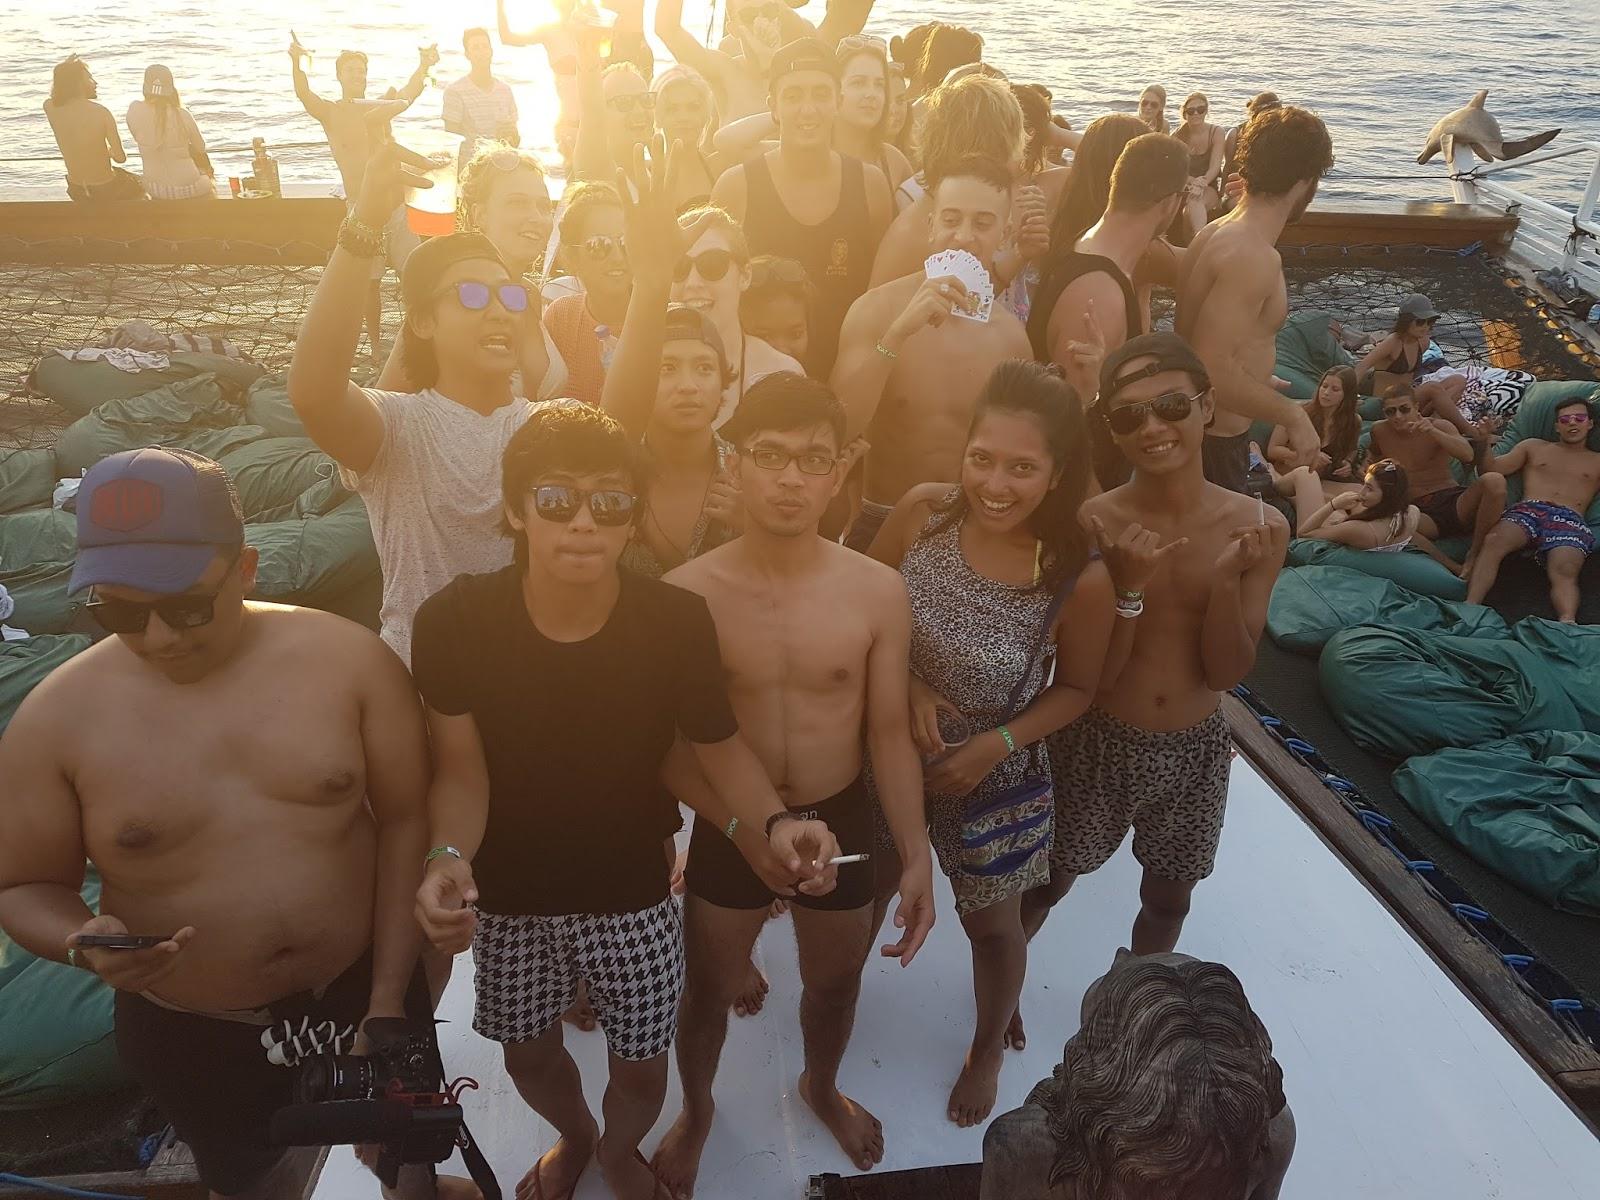 Jiggy boat party Gili Trawangan Indonesia - Ummi Goes Where?